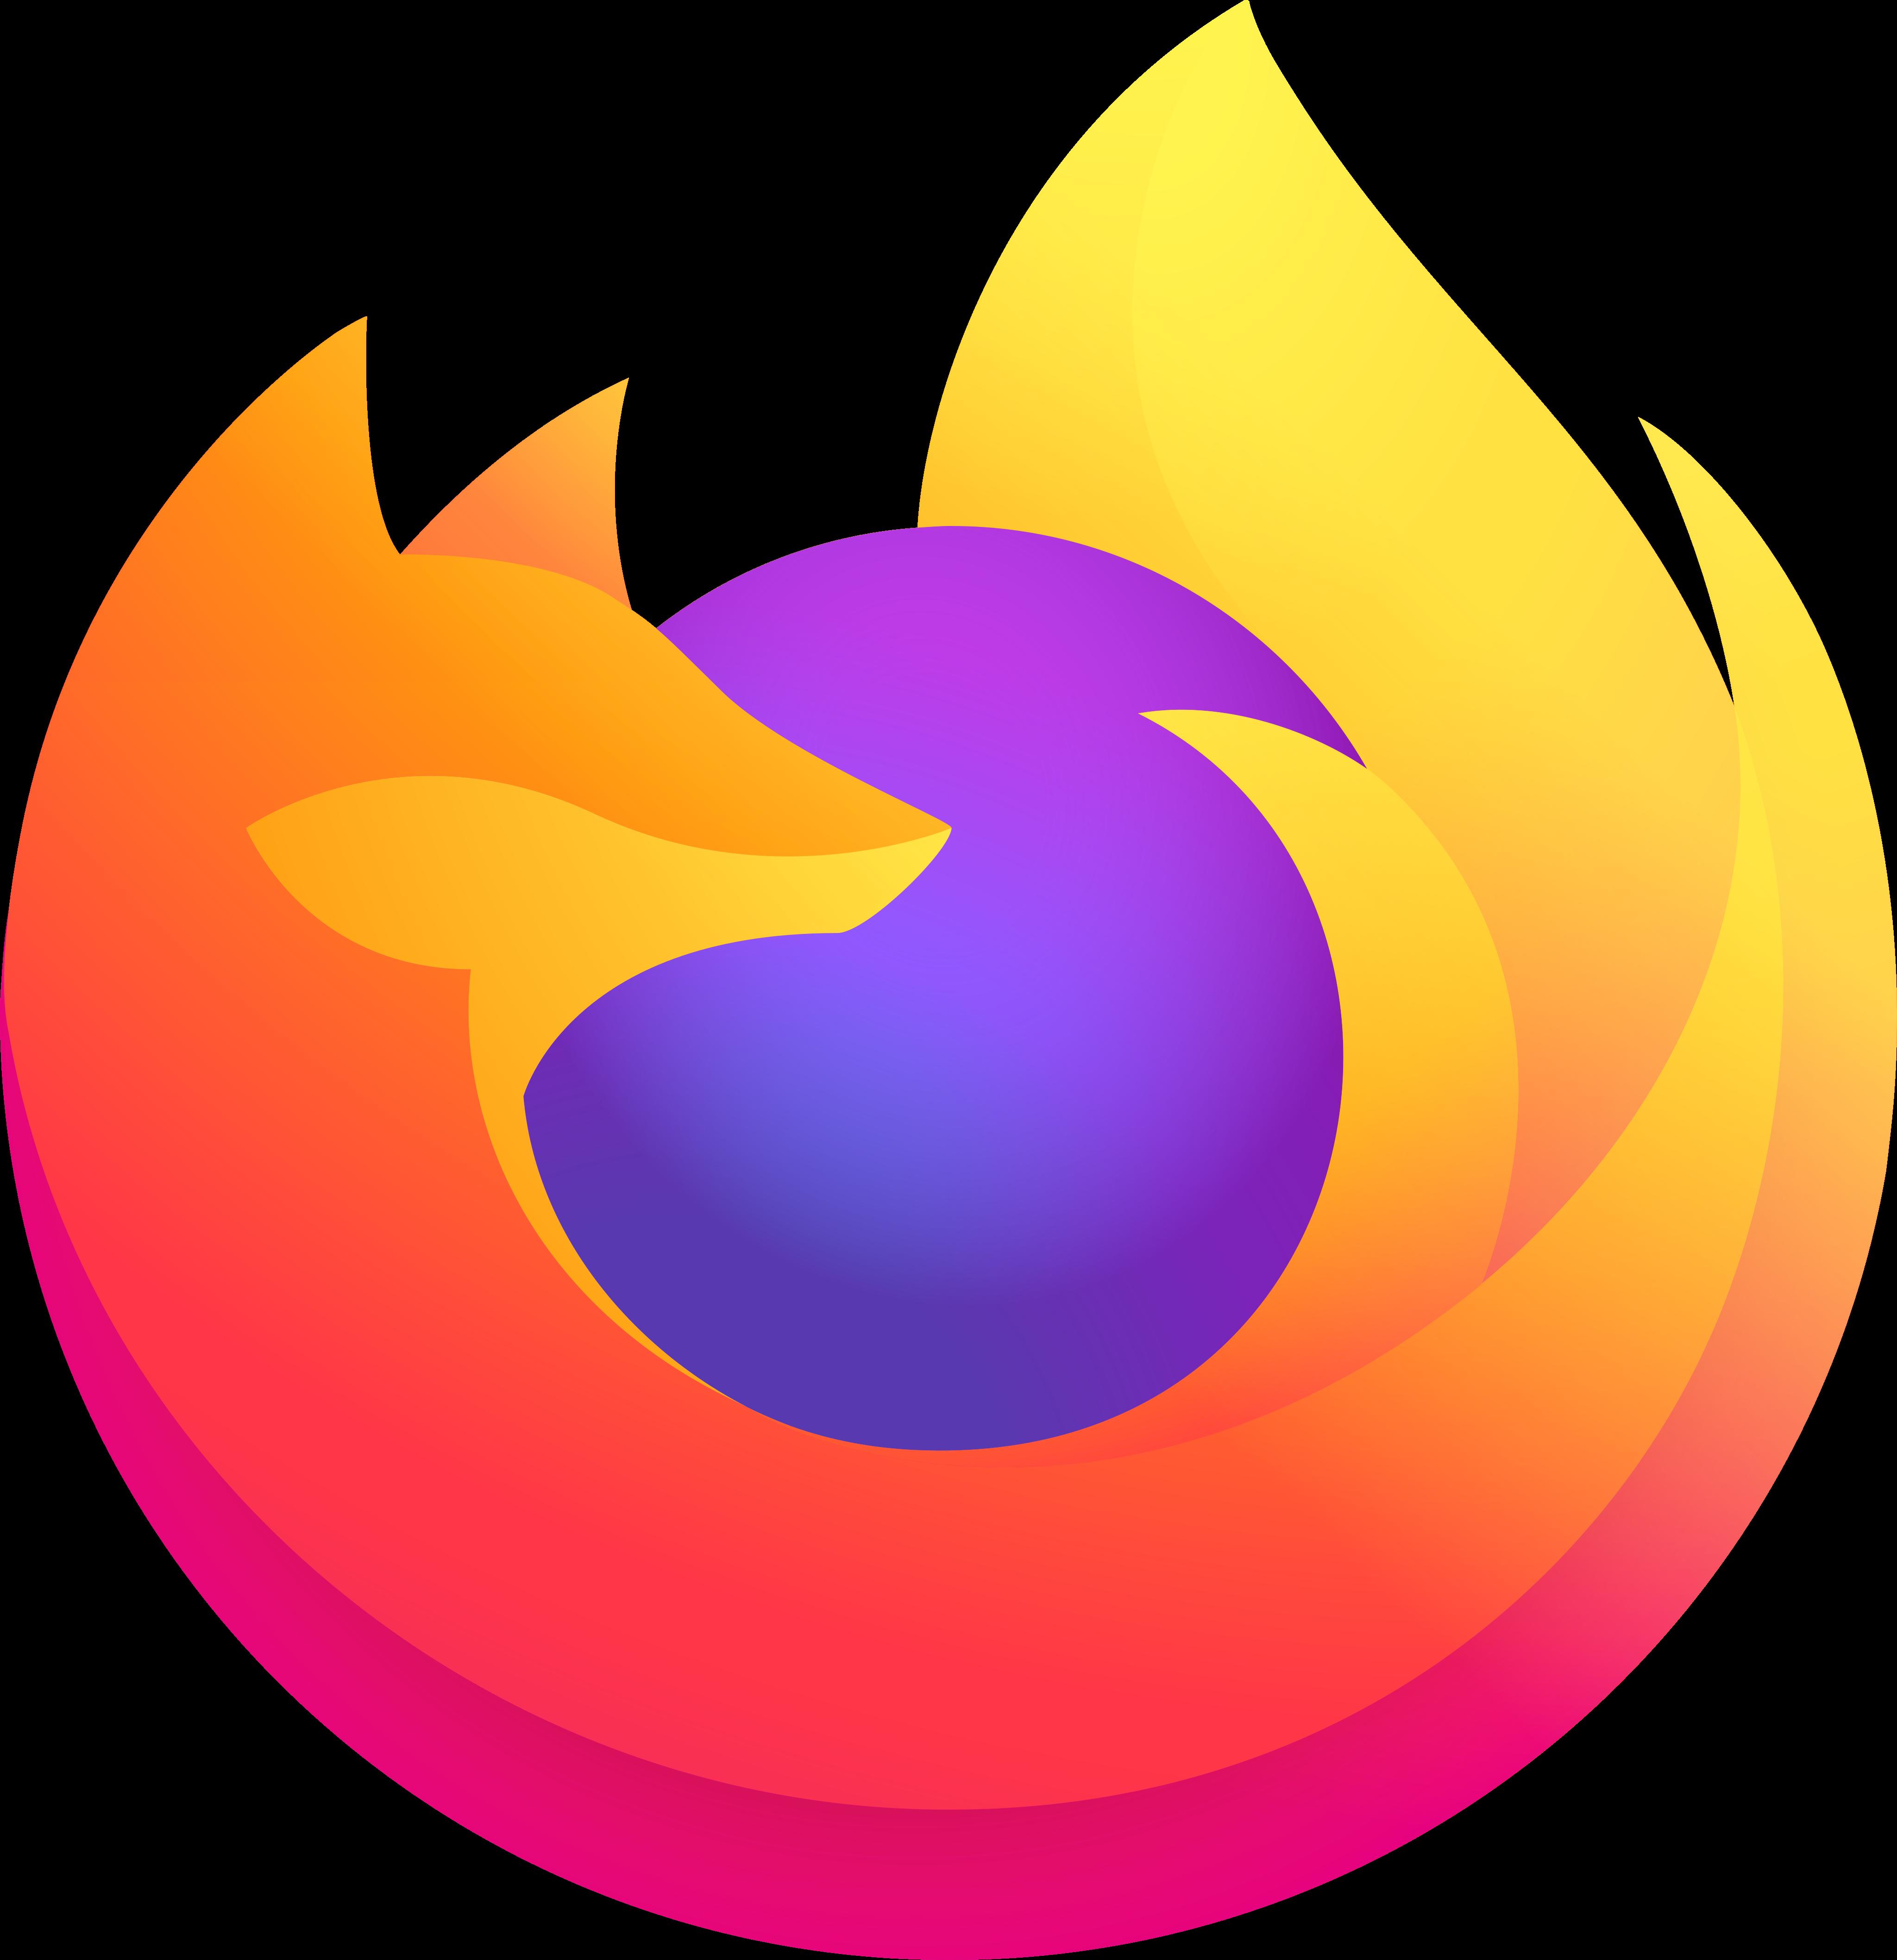 firefox logo 1 - Firefox Logo